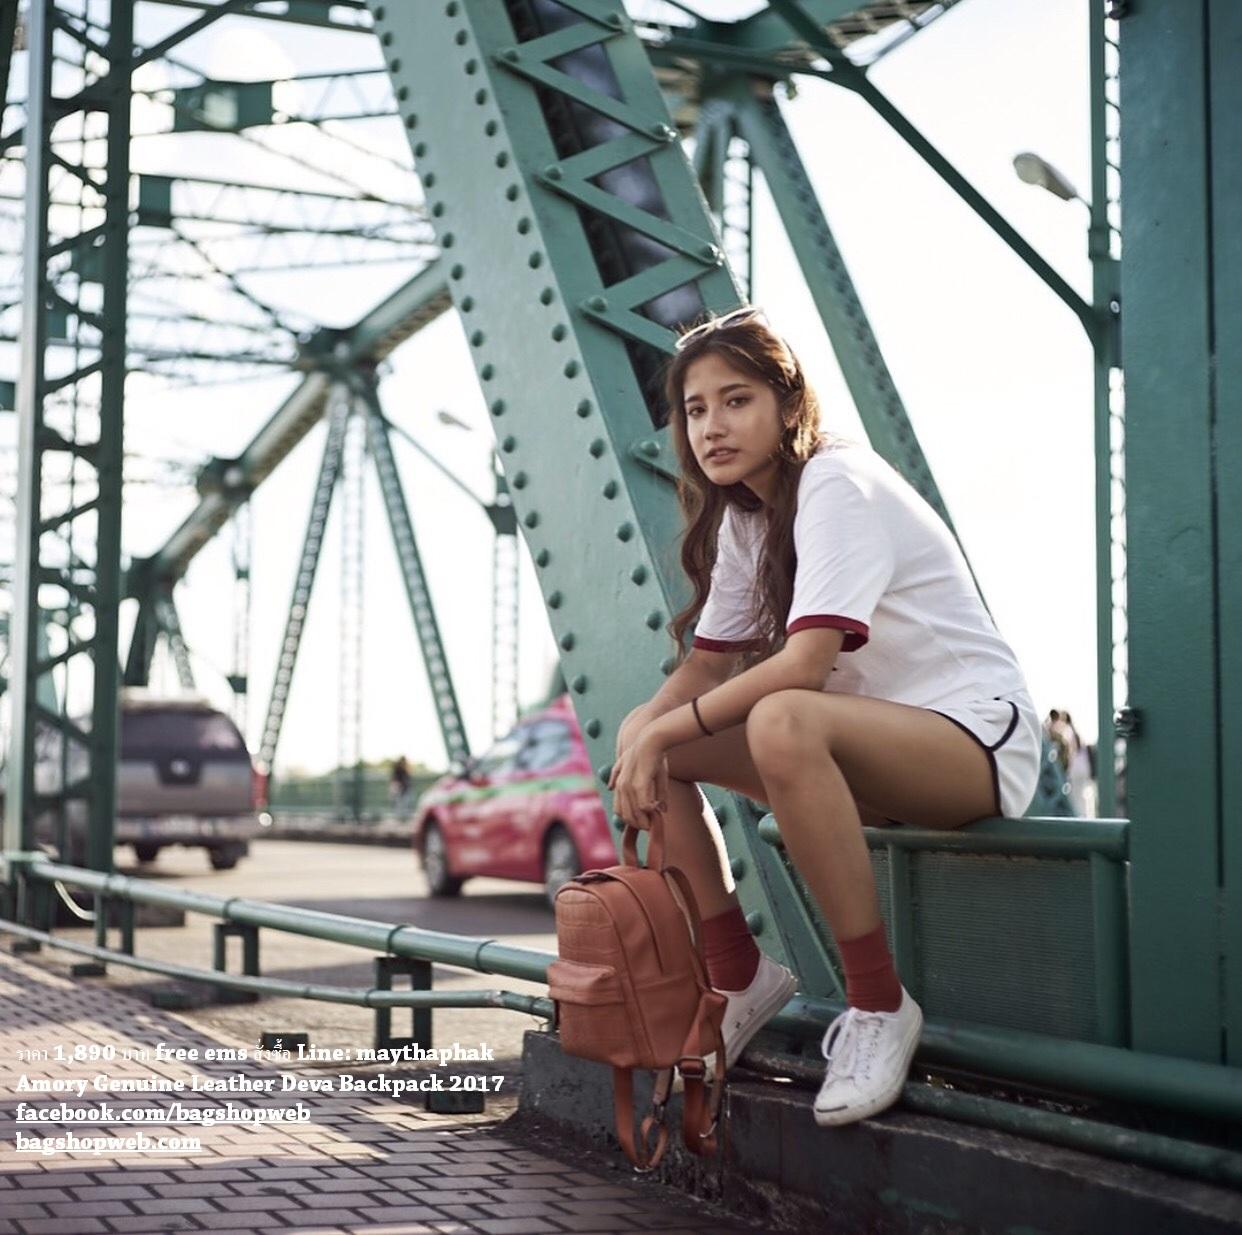 Amory Genuine Leather Deva Backpack 2017